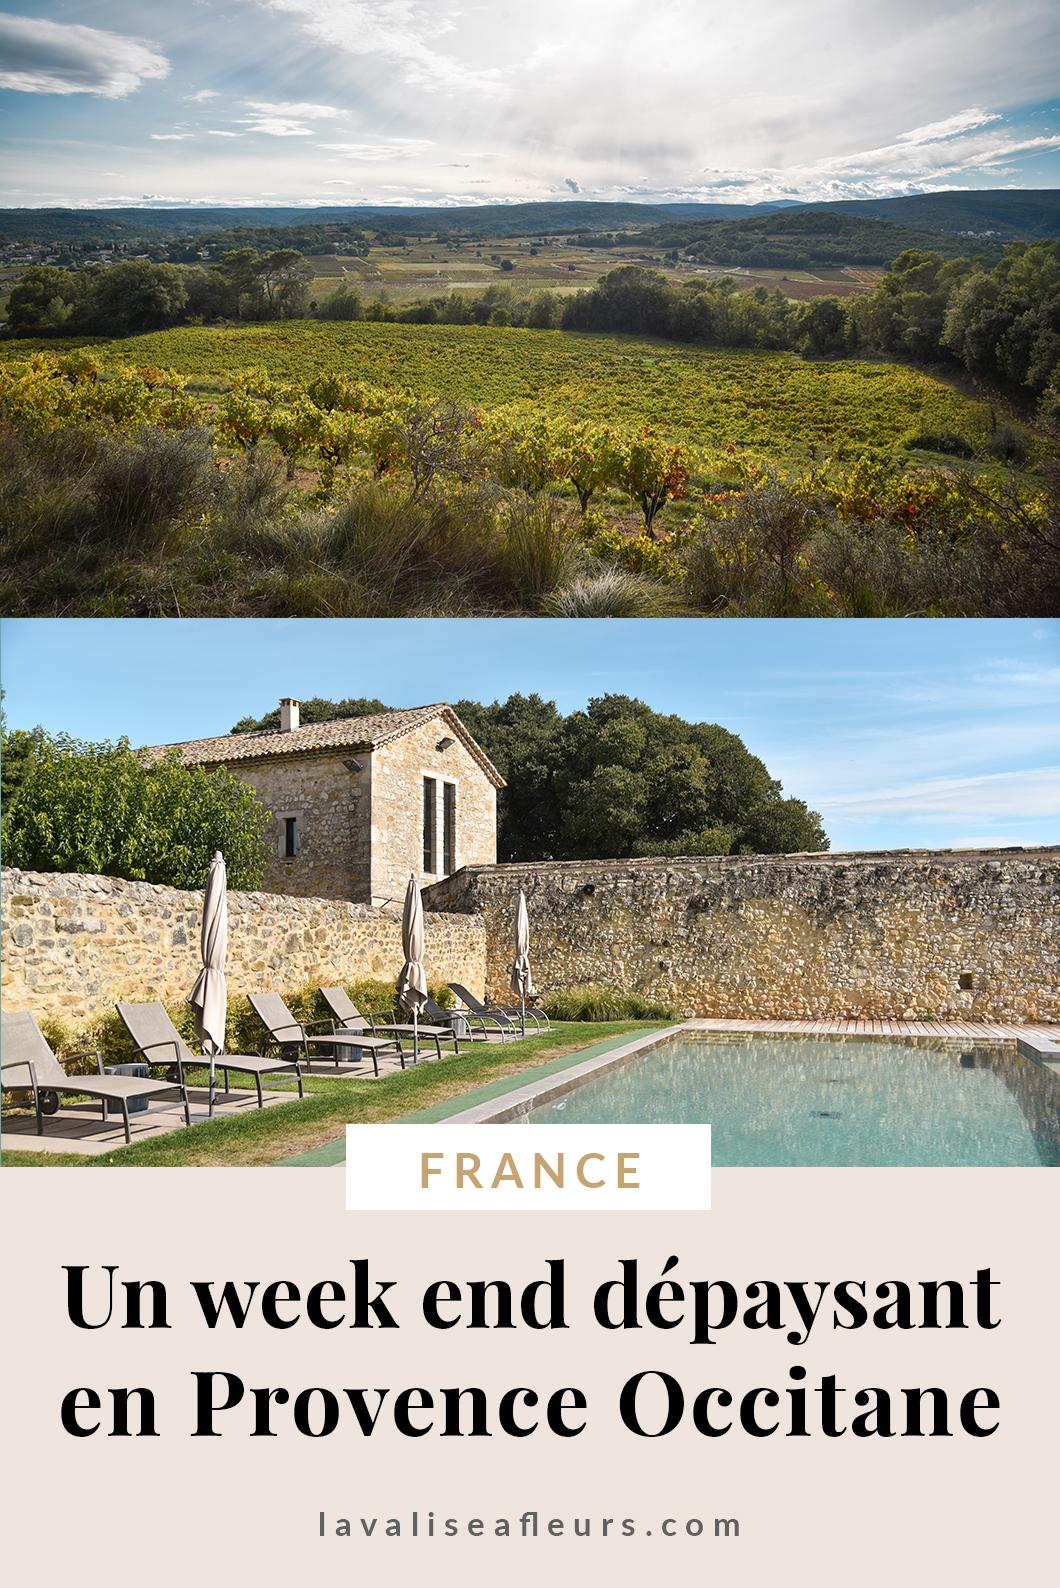 Un week end dépaysant en Provence Occitane en France